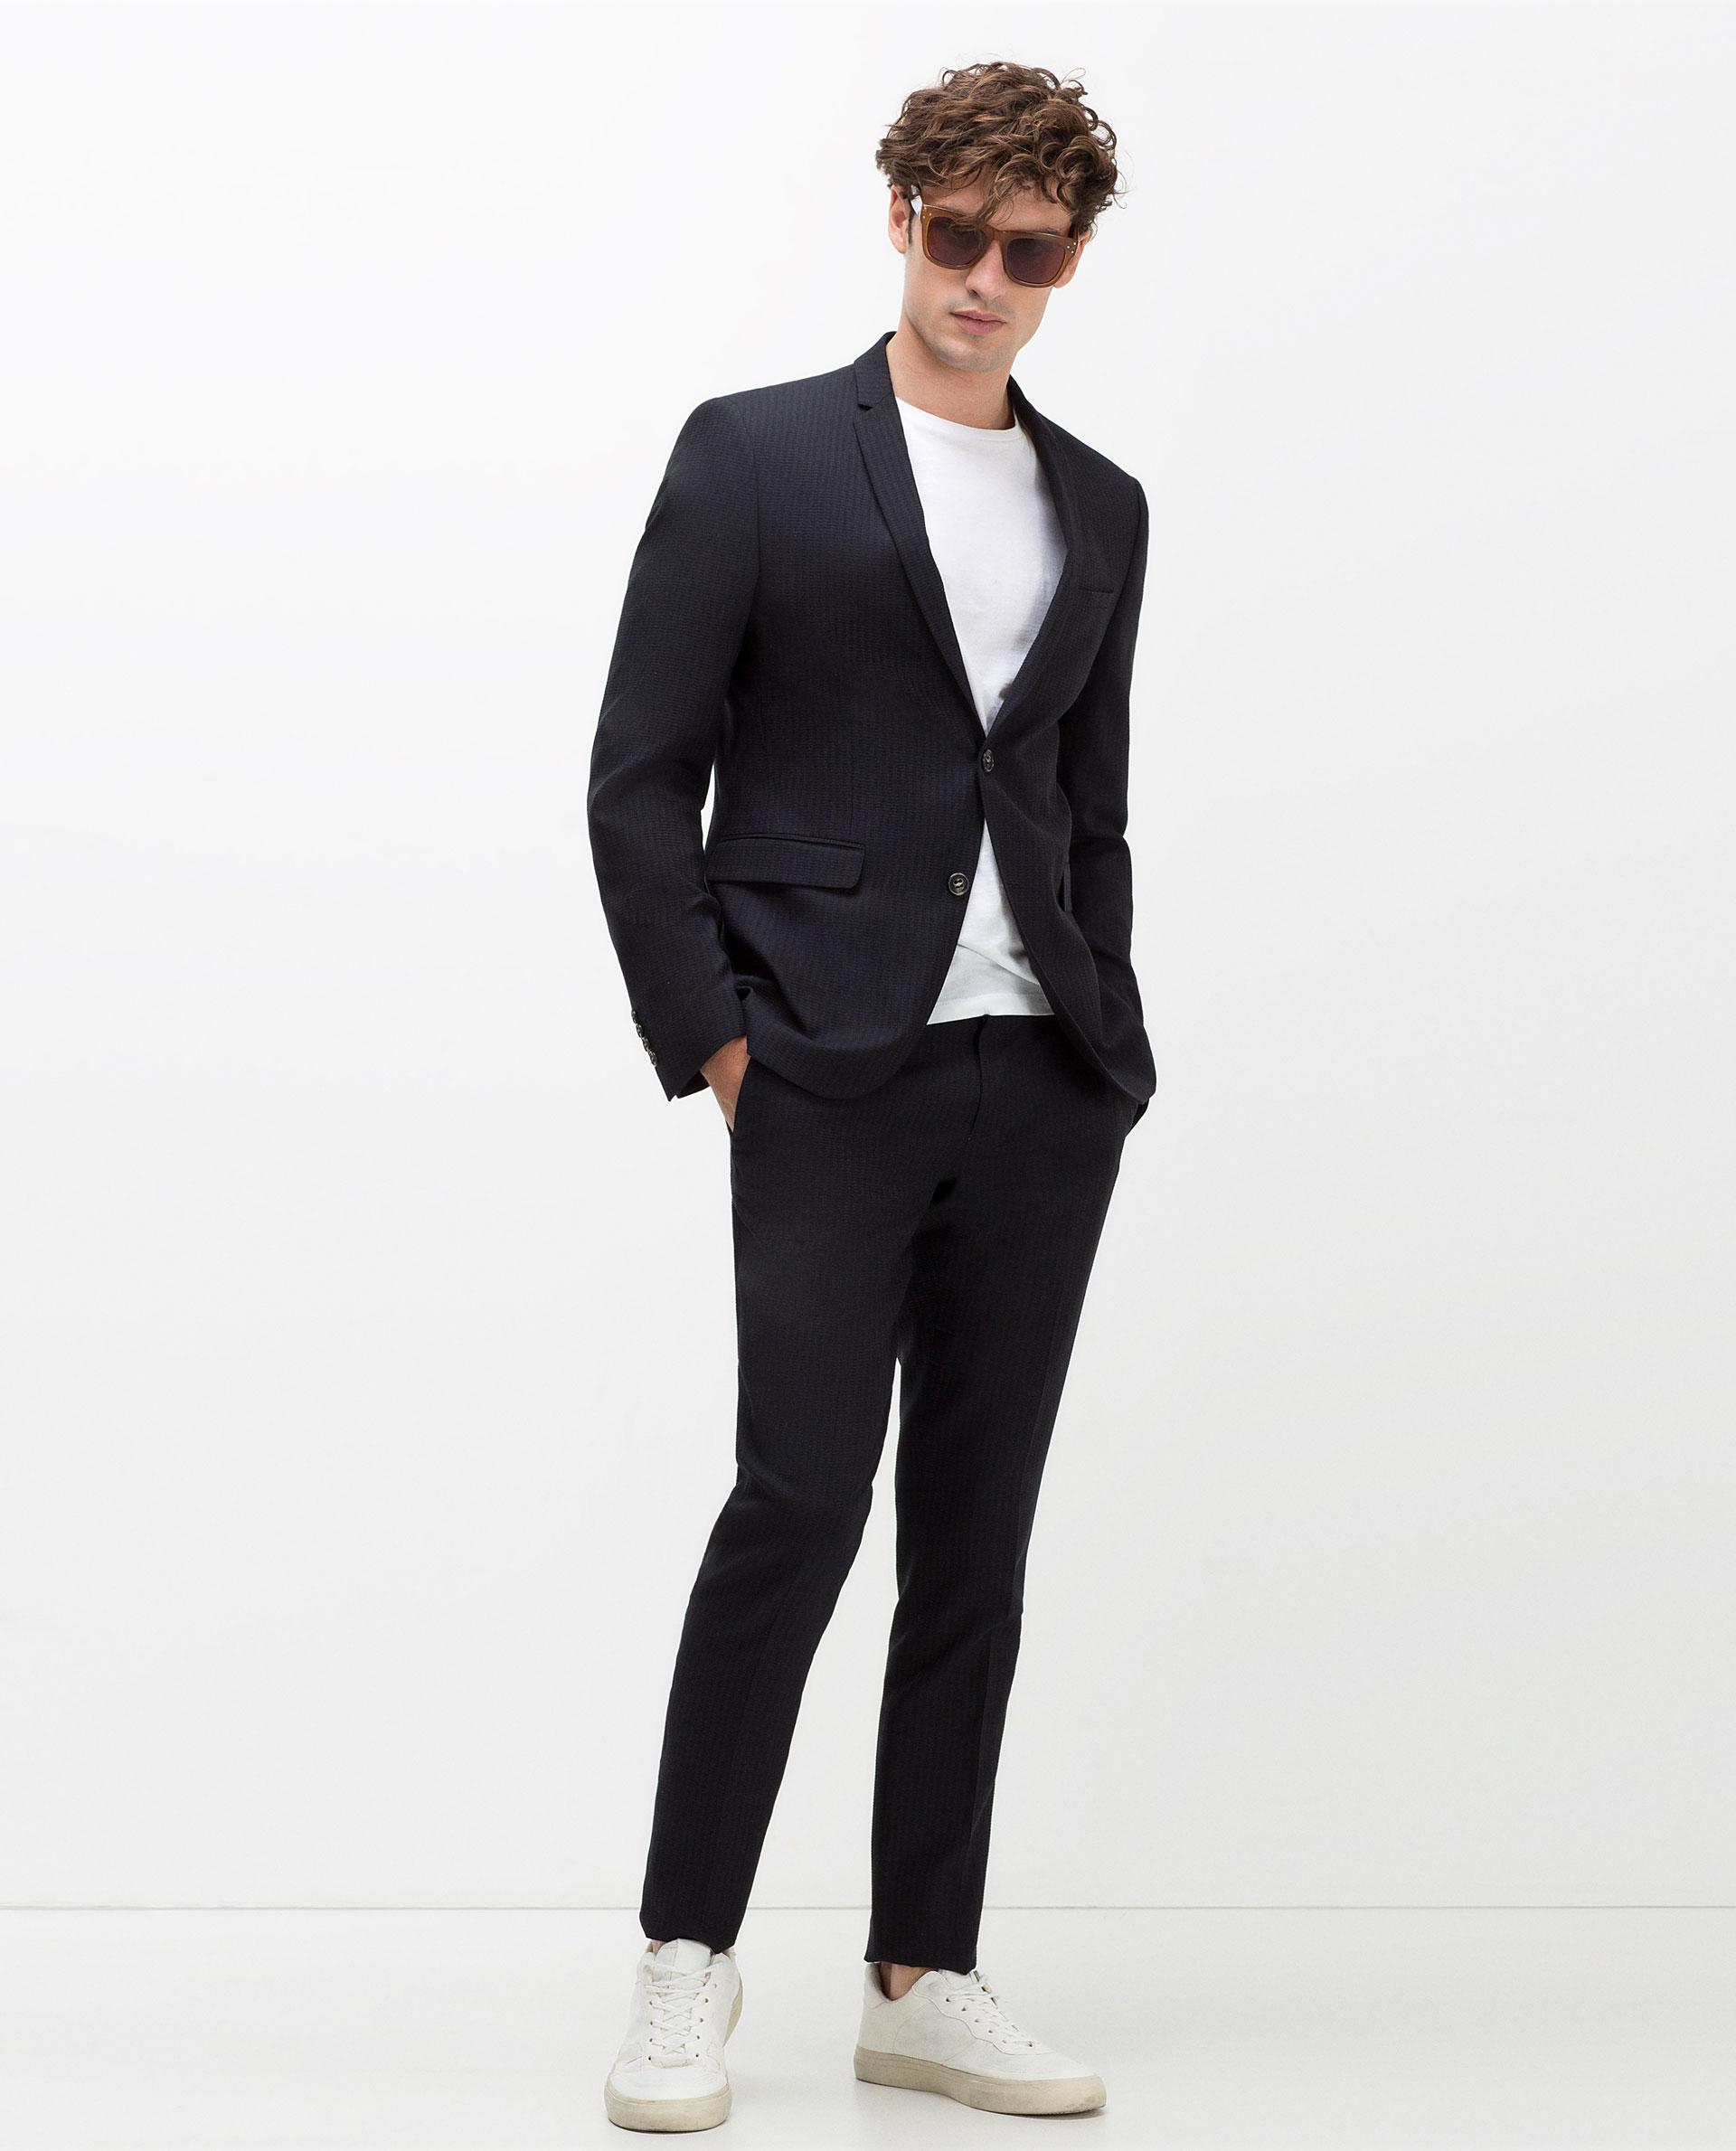 Zara Slim Fit Suit | My Dress Tip